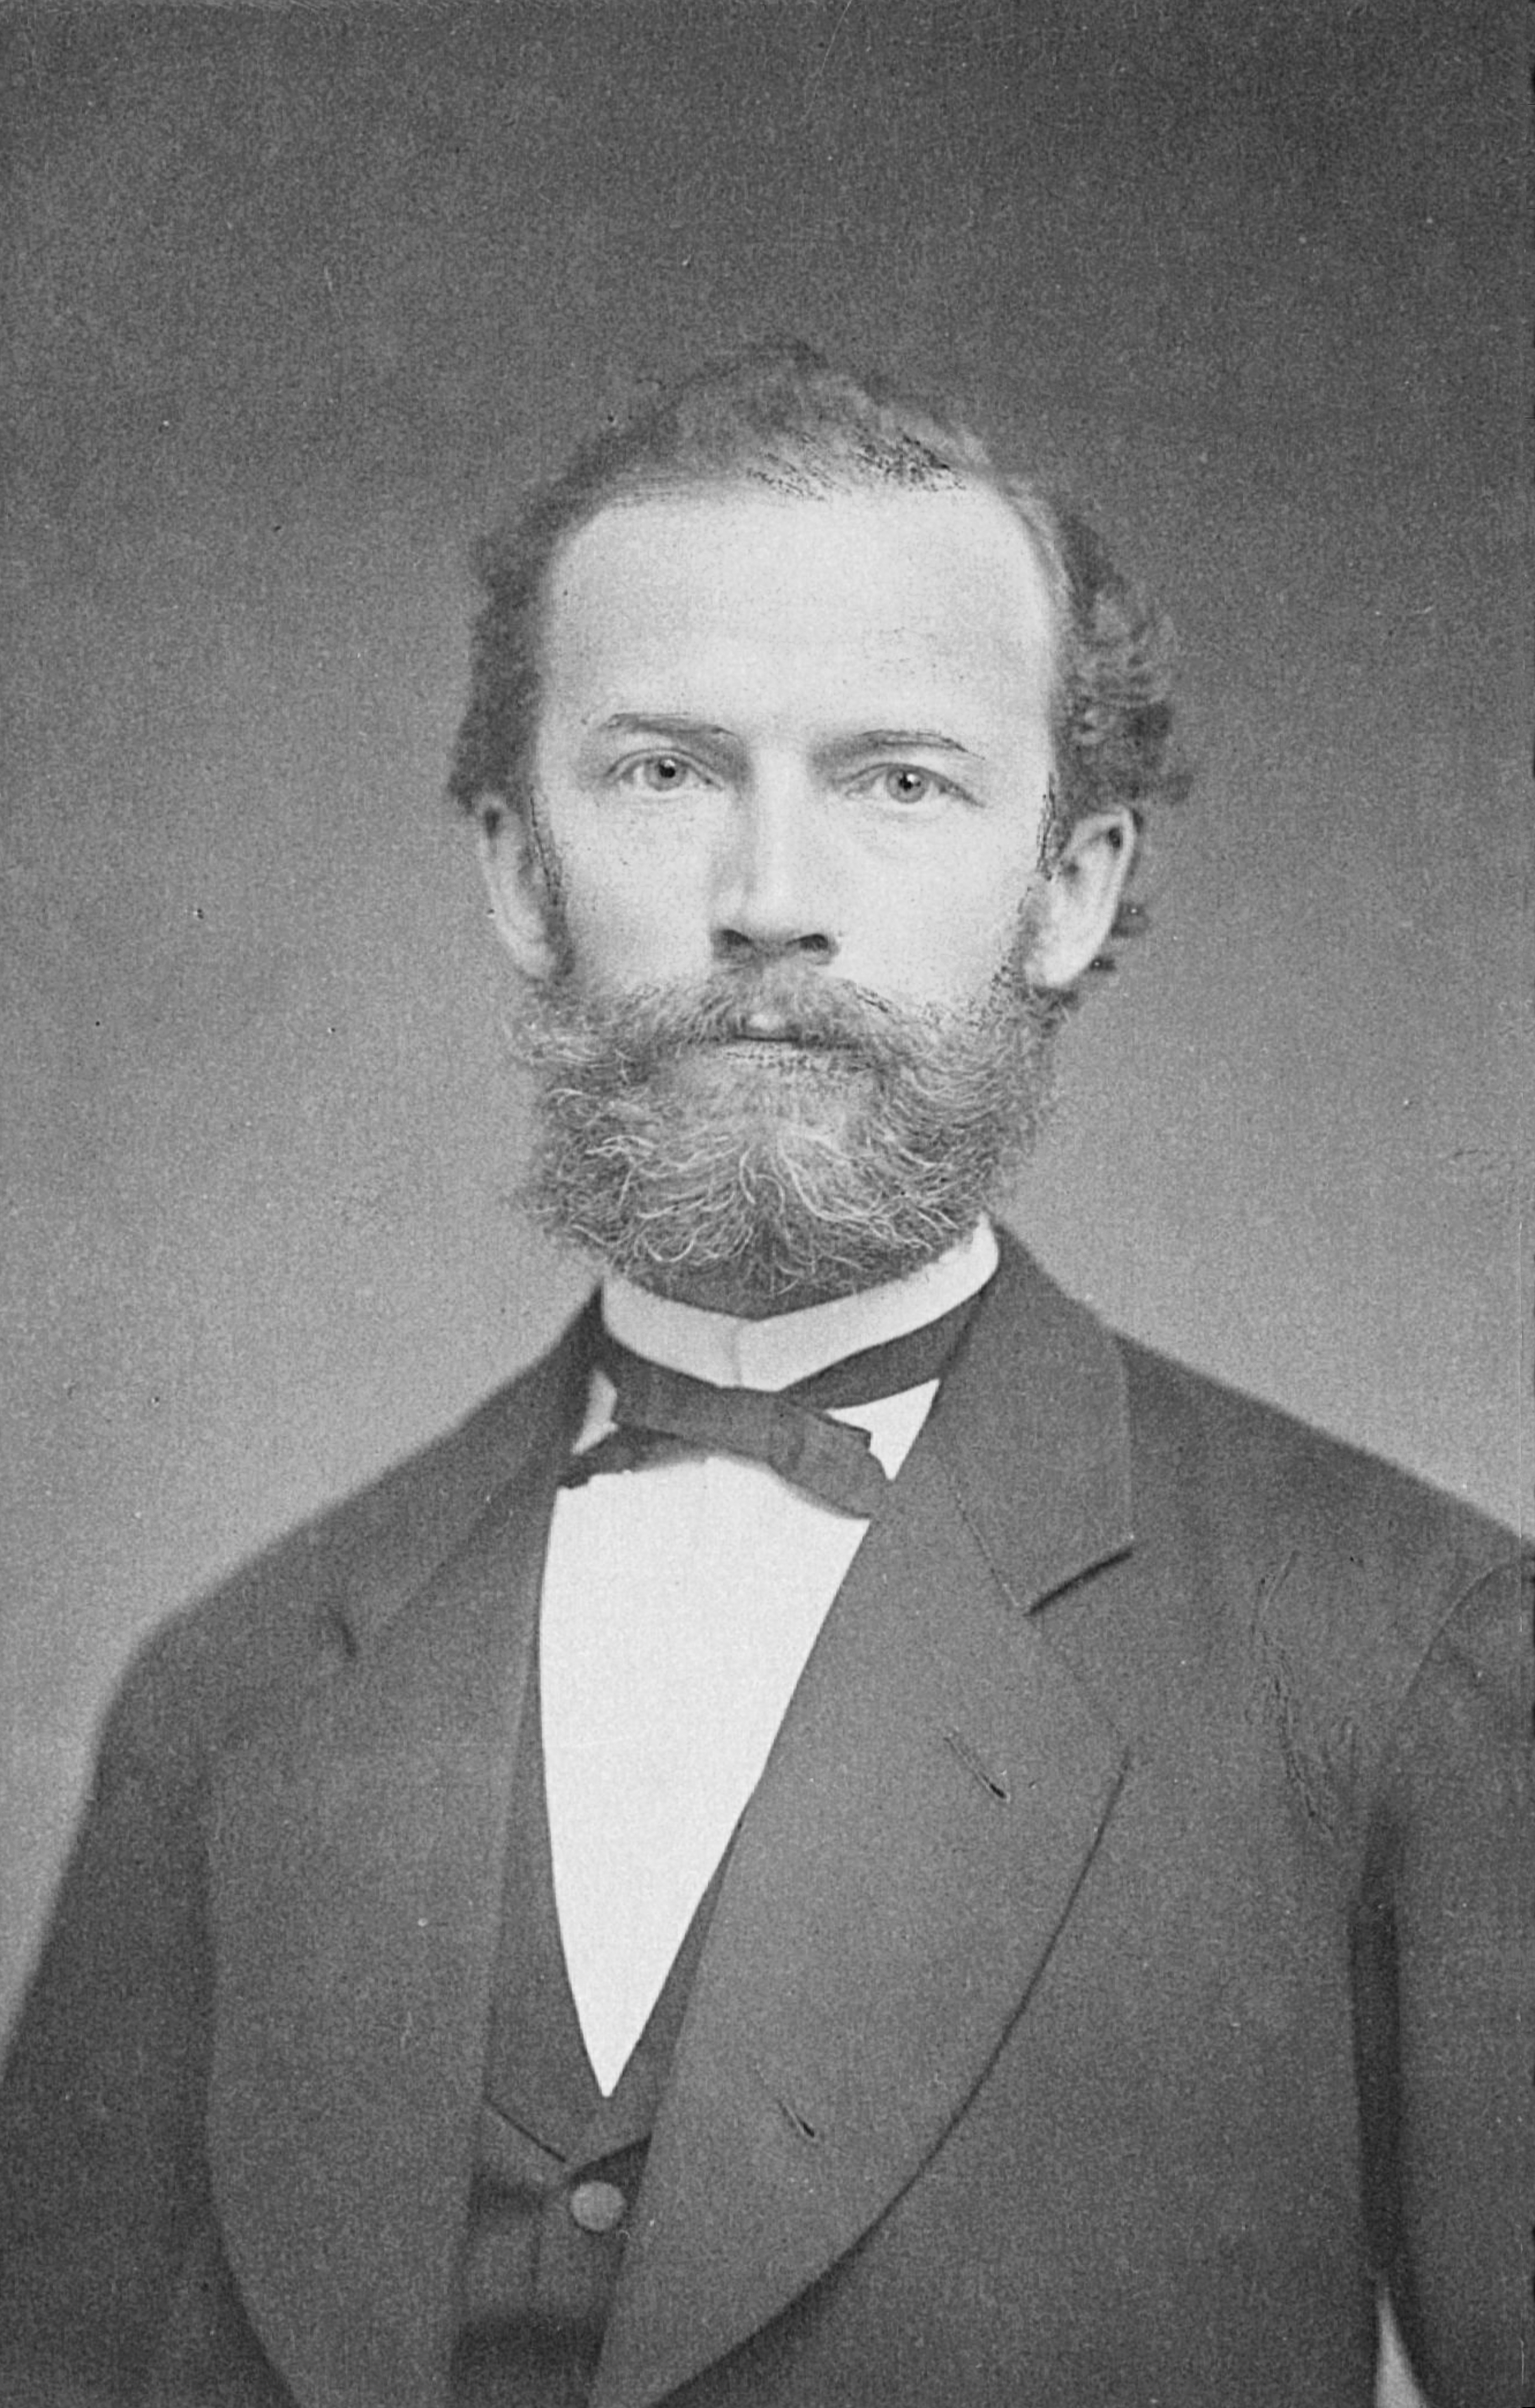 image of Friedrich Kohlrausch